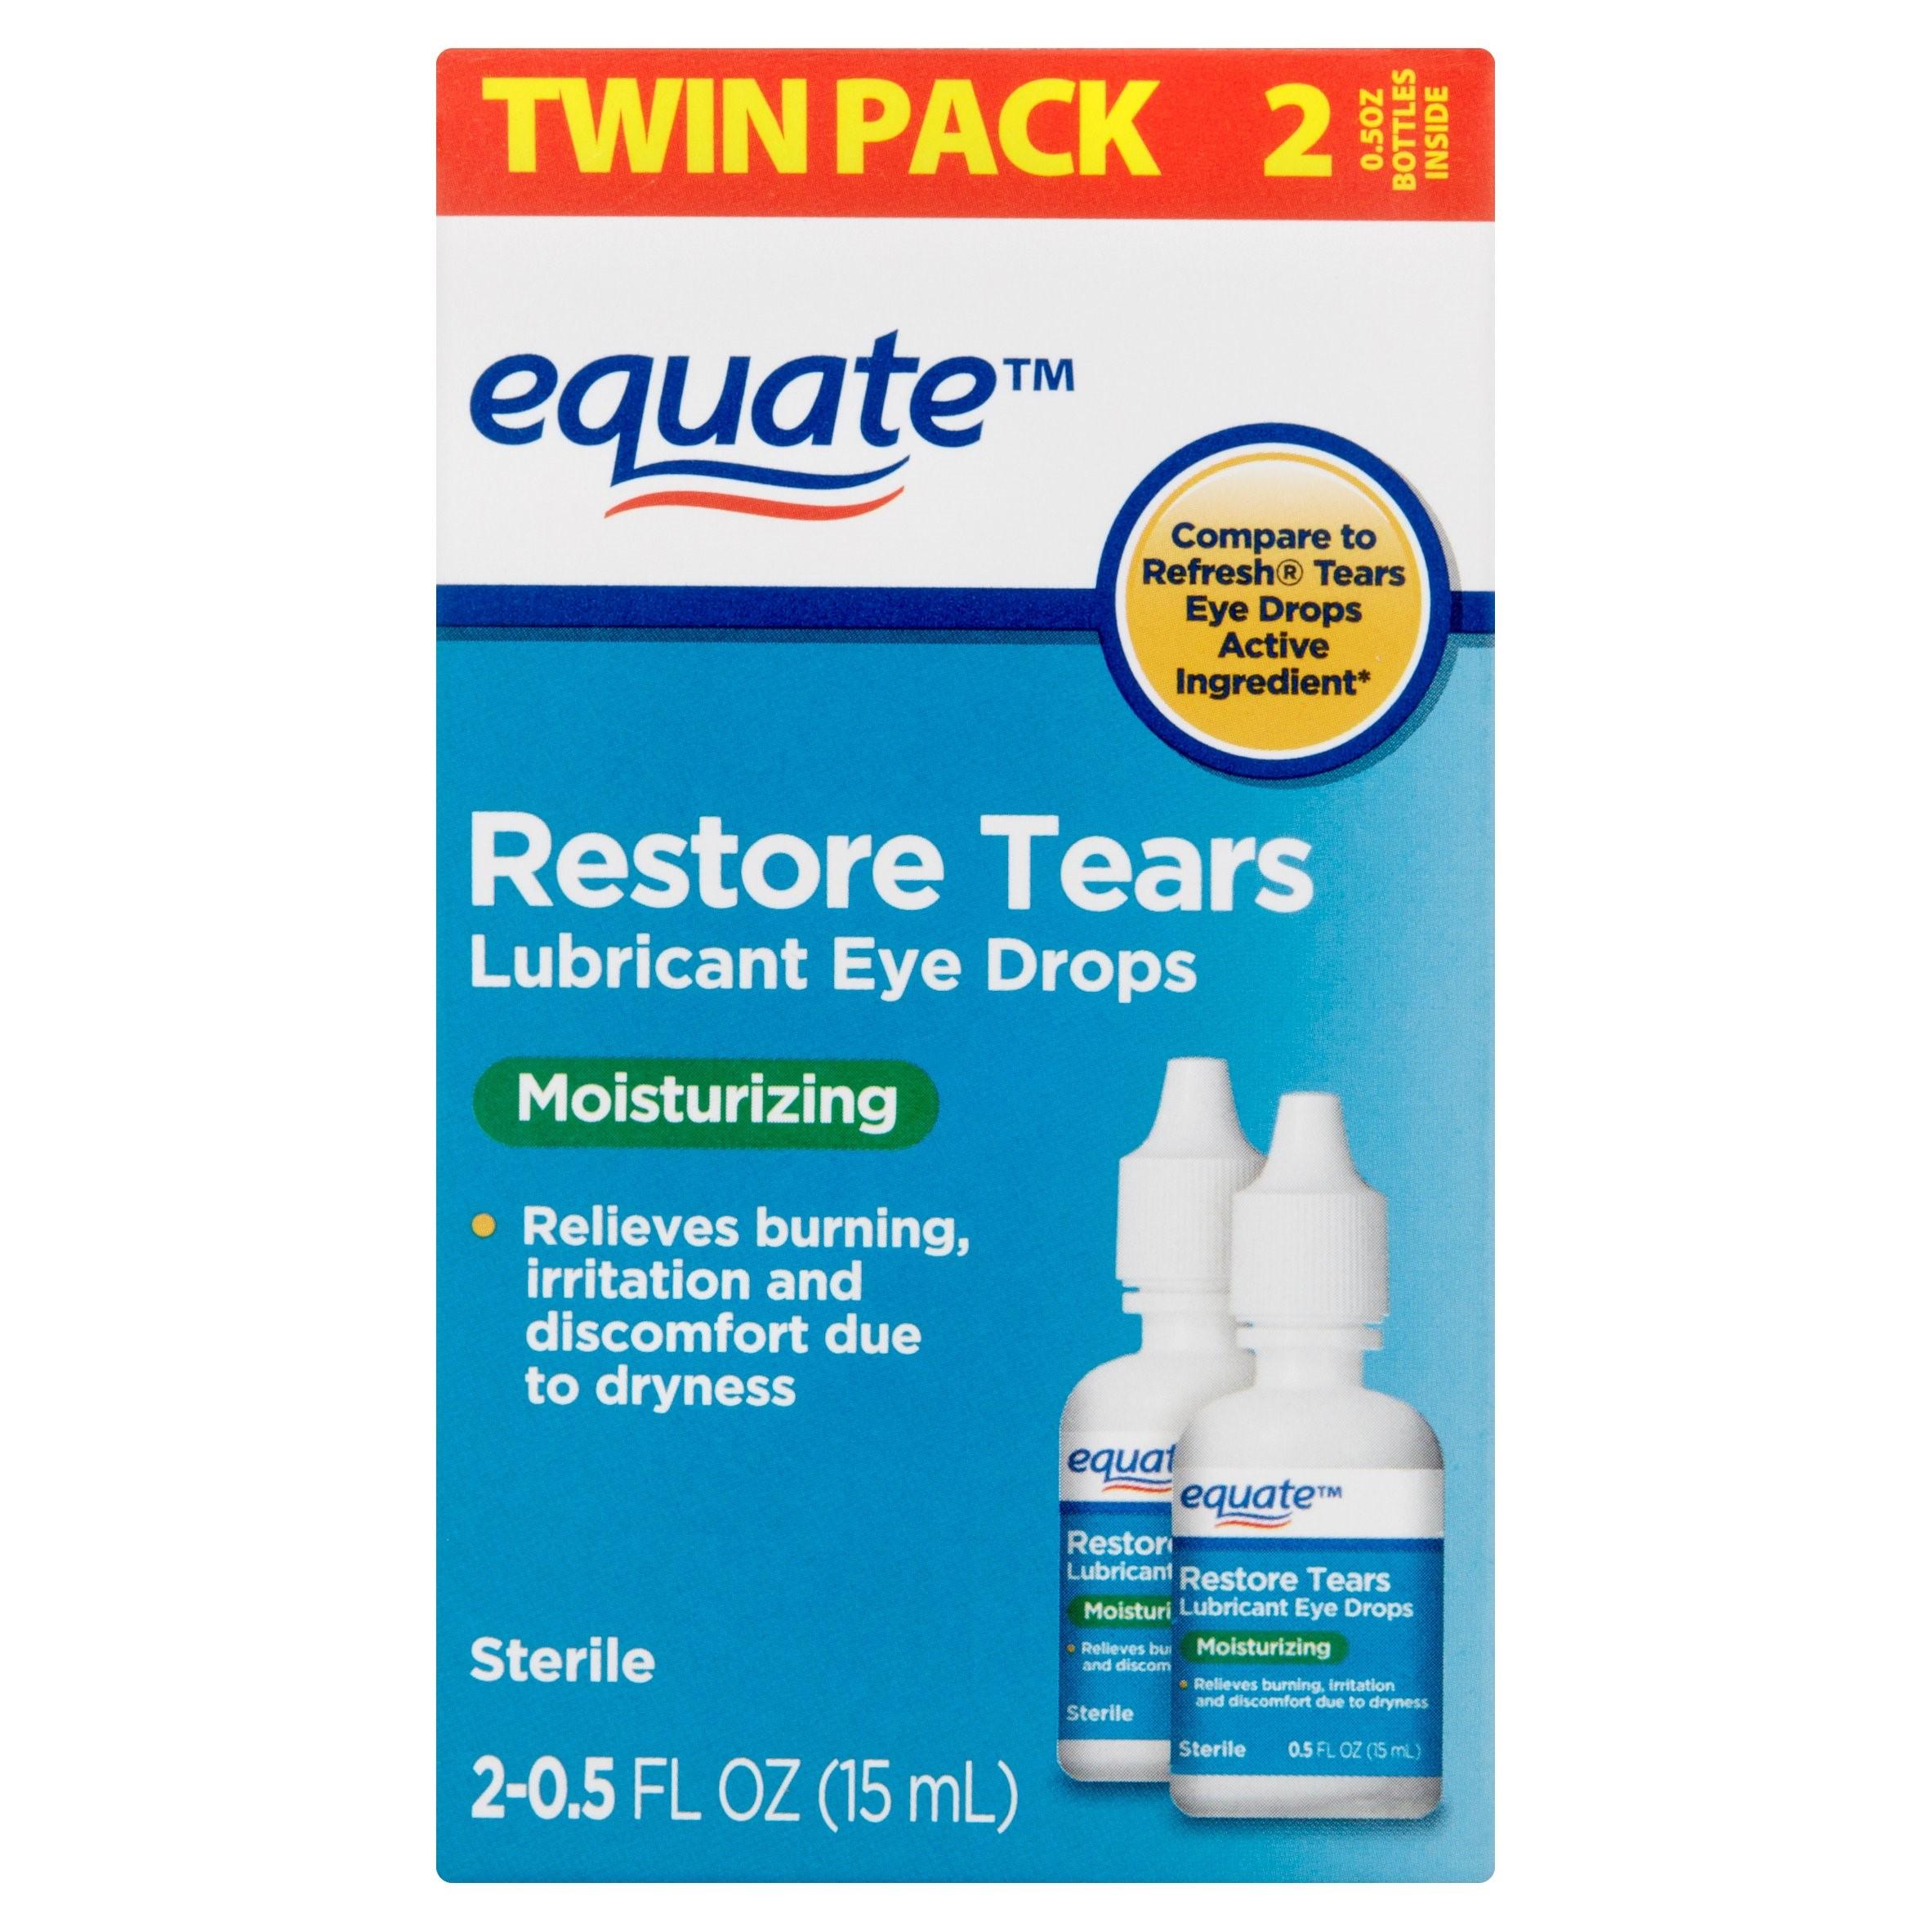 Equate Restore Tears Lubricant Eye Drops, 0.5 Oz, 2 Pk